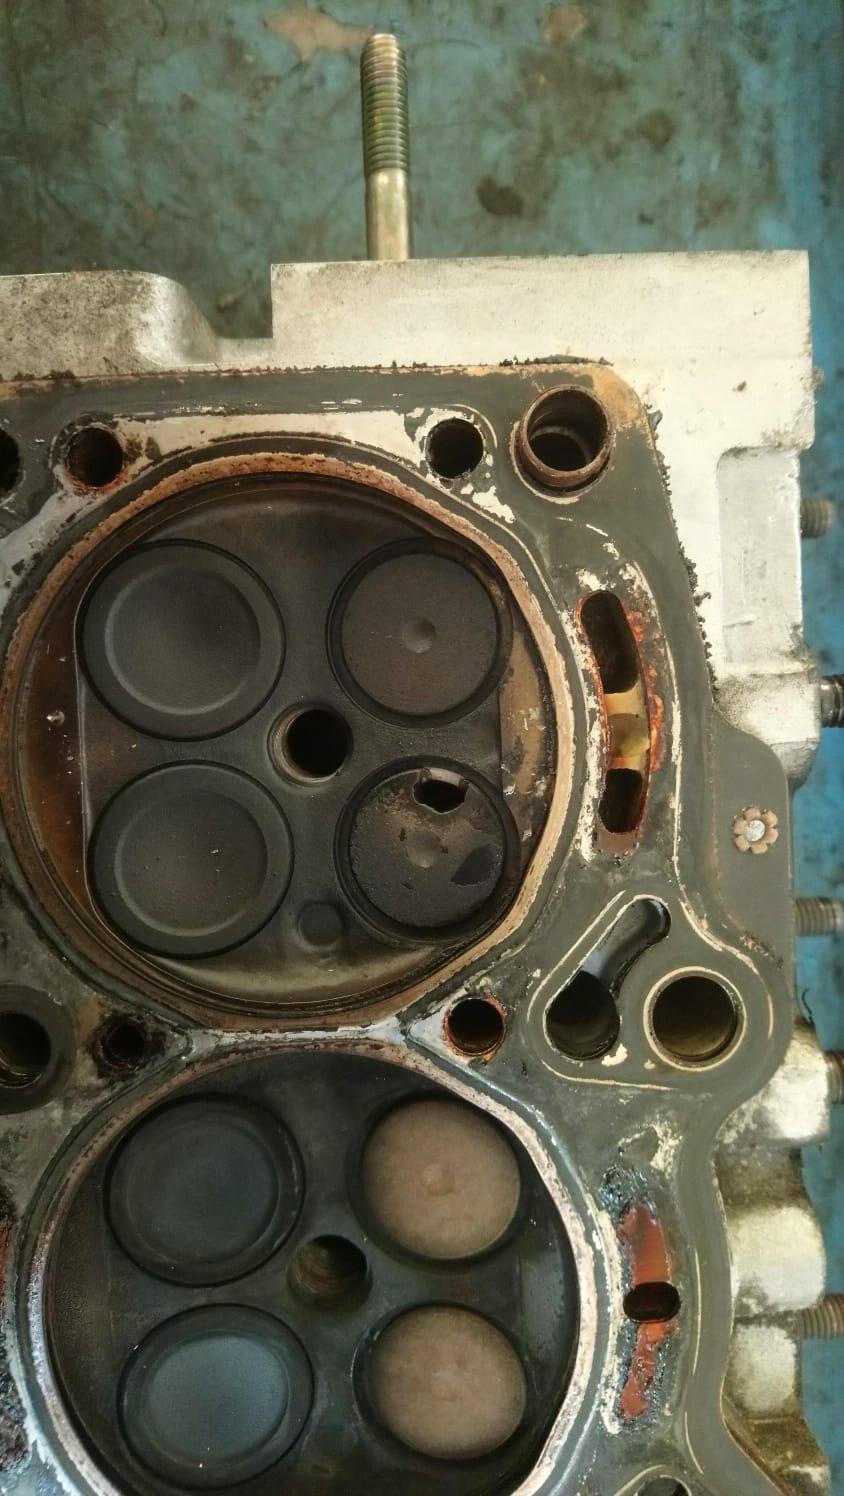 alfa romeo giulietta 1.4 turbo 120 cv gpl problemi